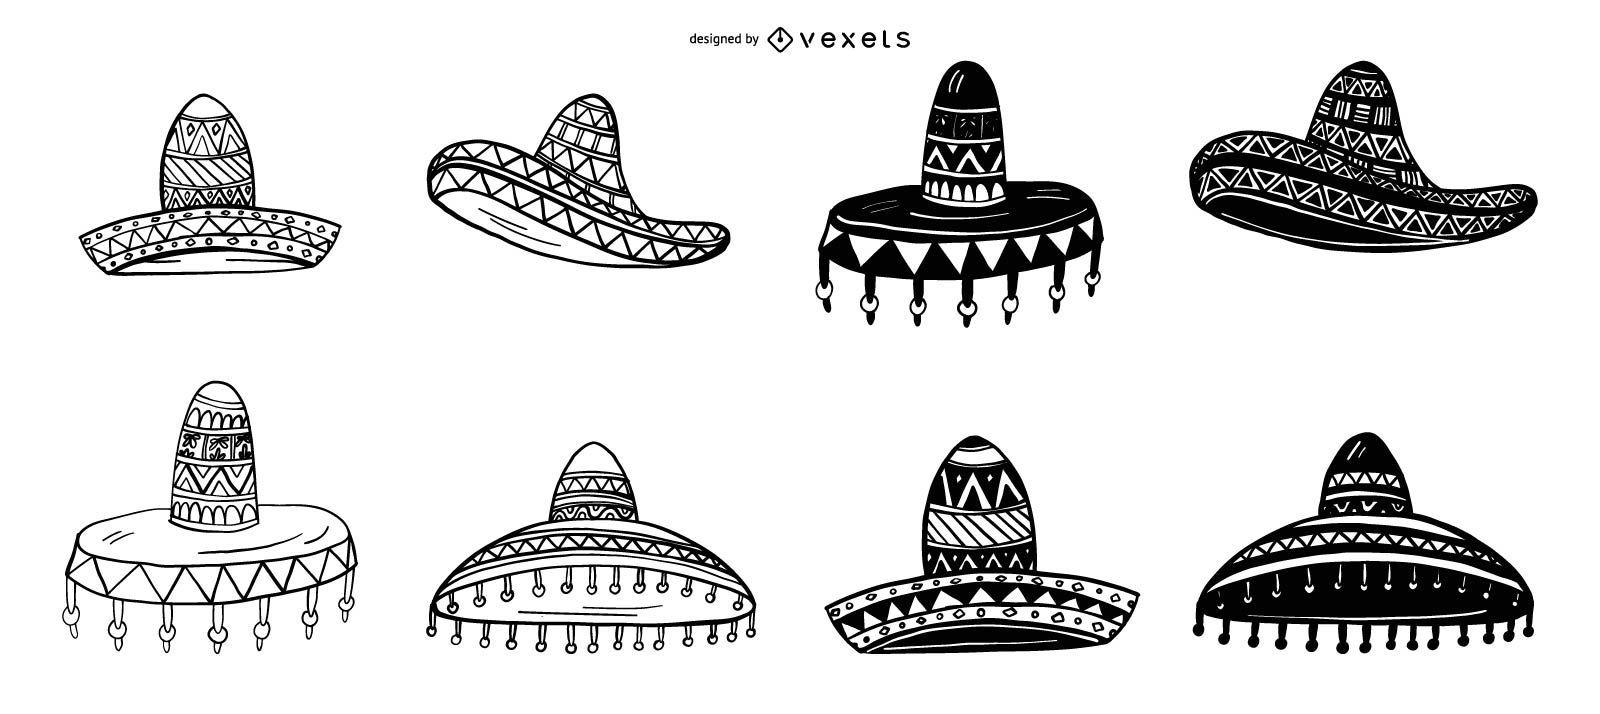 Mexican Hat Illustration Set